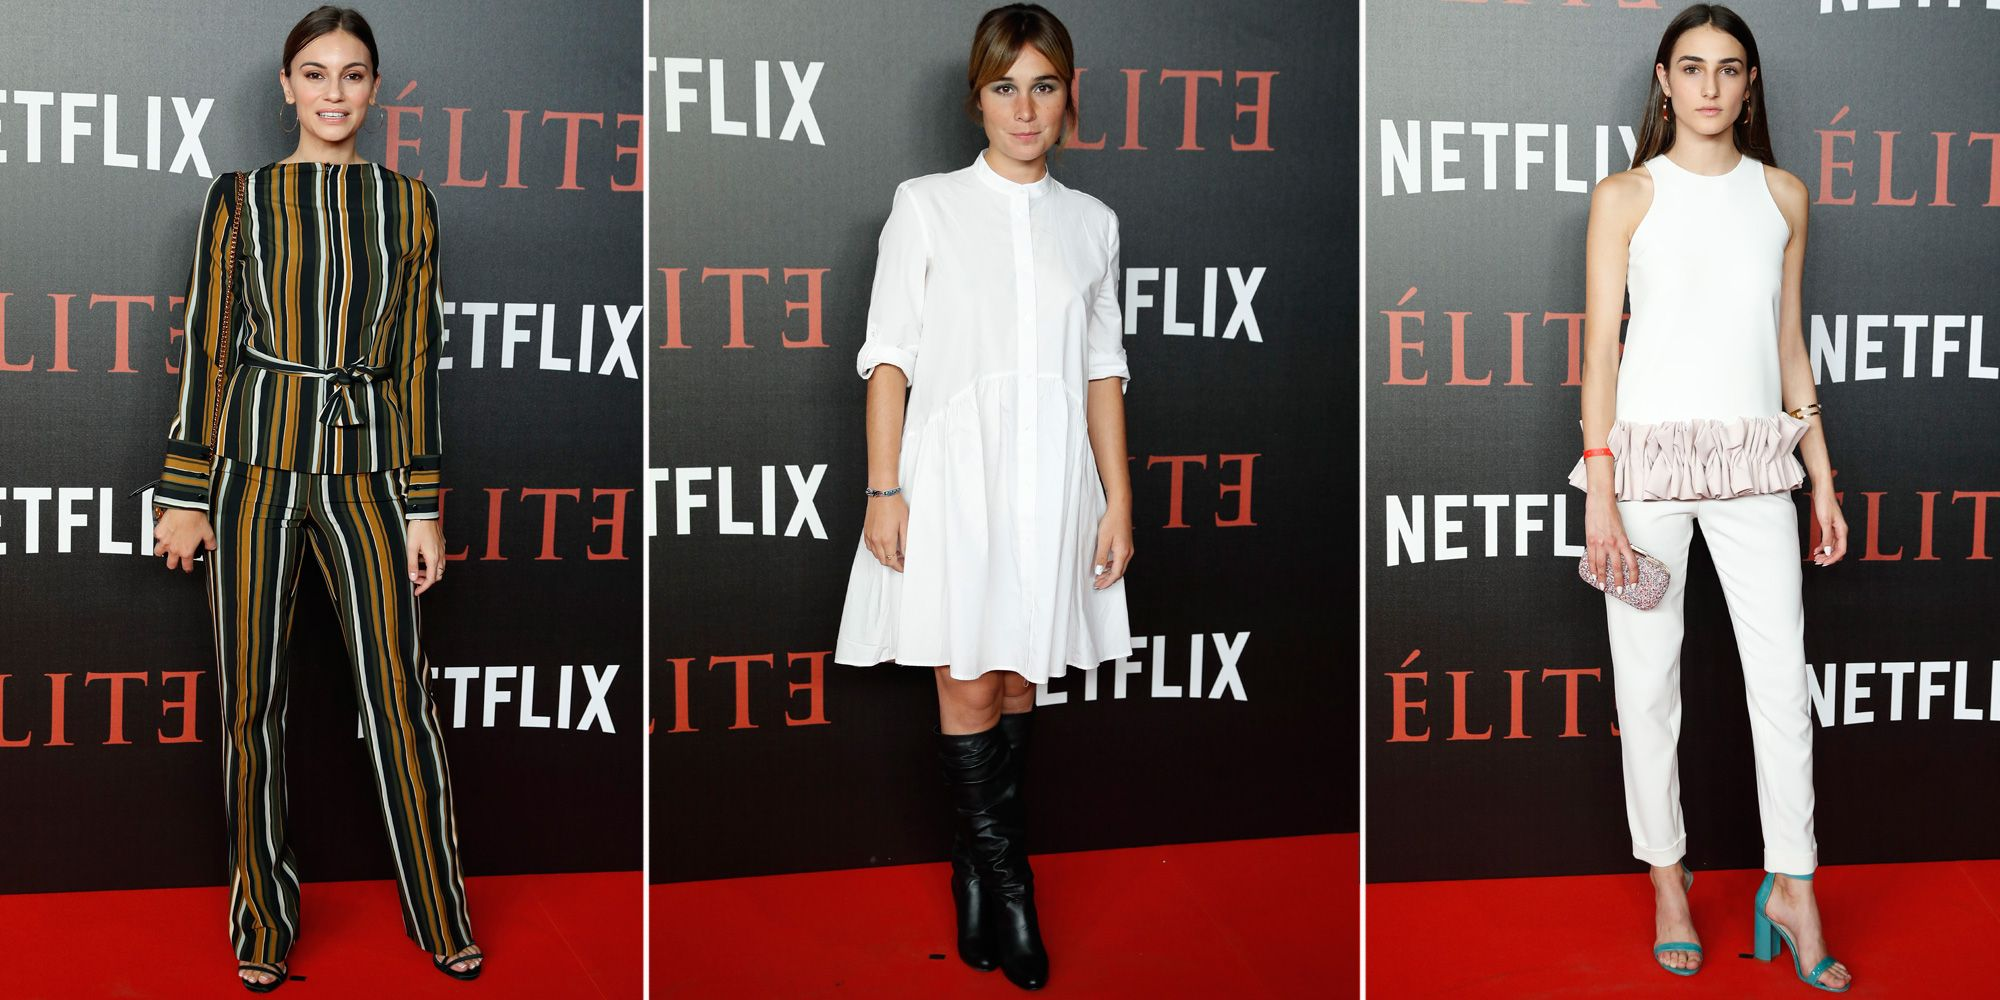 Los mejores looks del estreno de la serie de Netflix 'Élite'